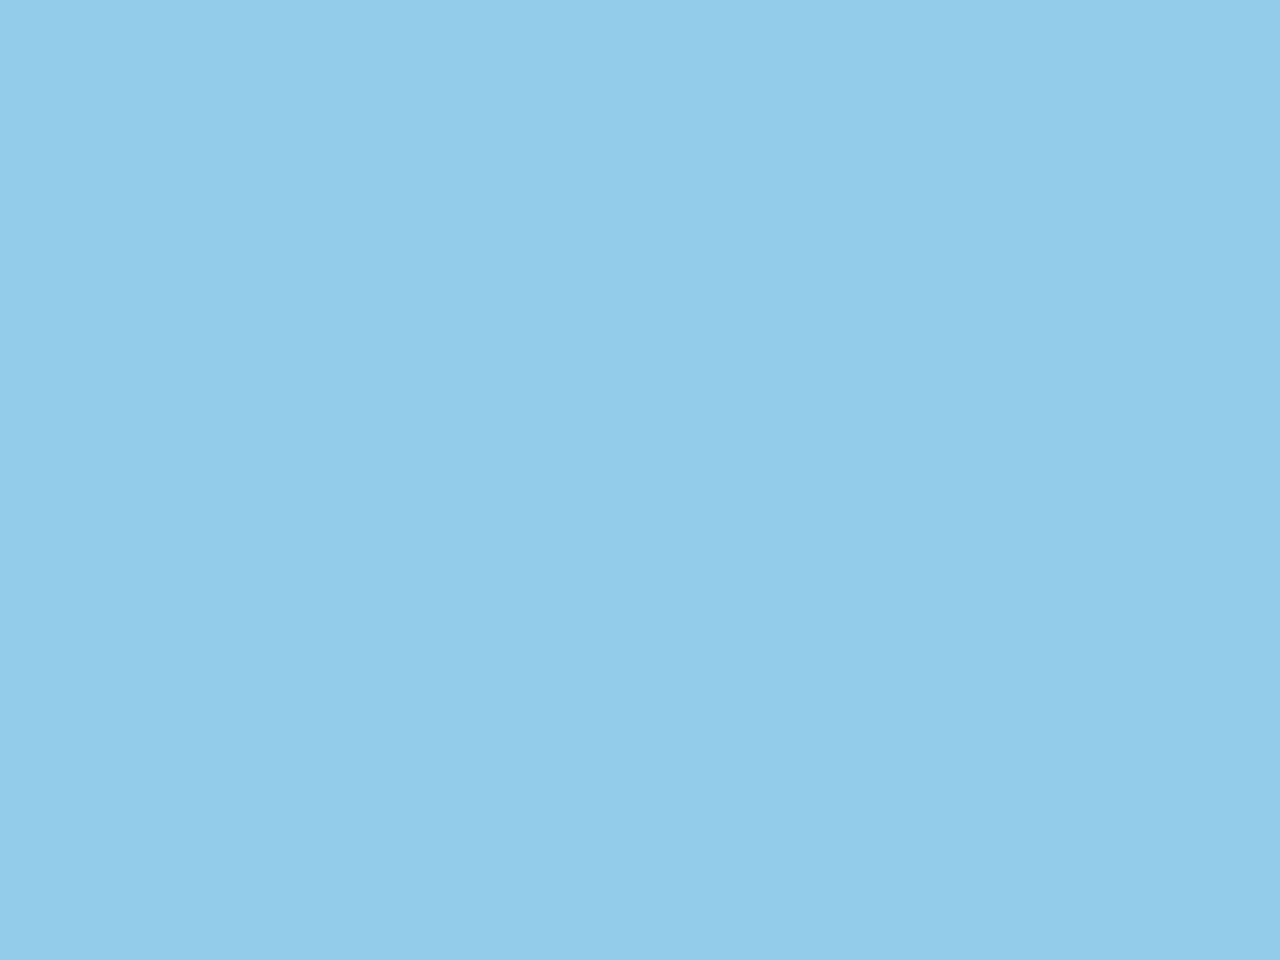 1280x960 Light Cornflower Blue Solid Color Background